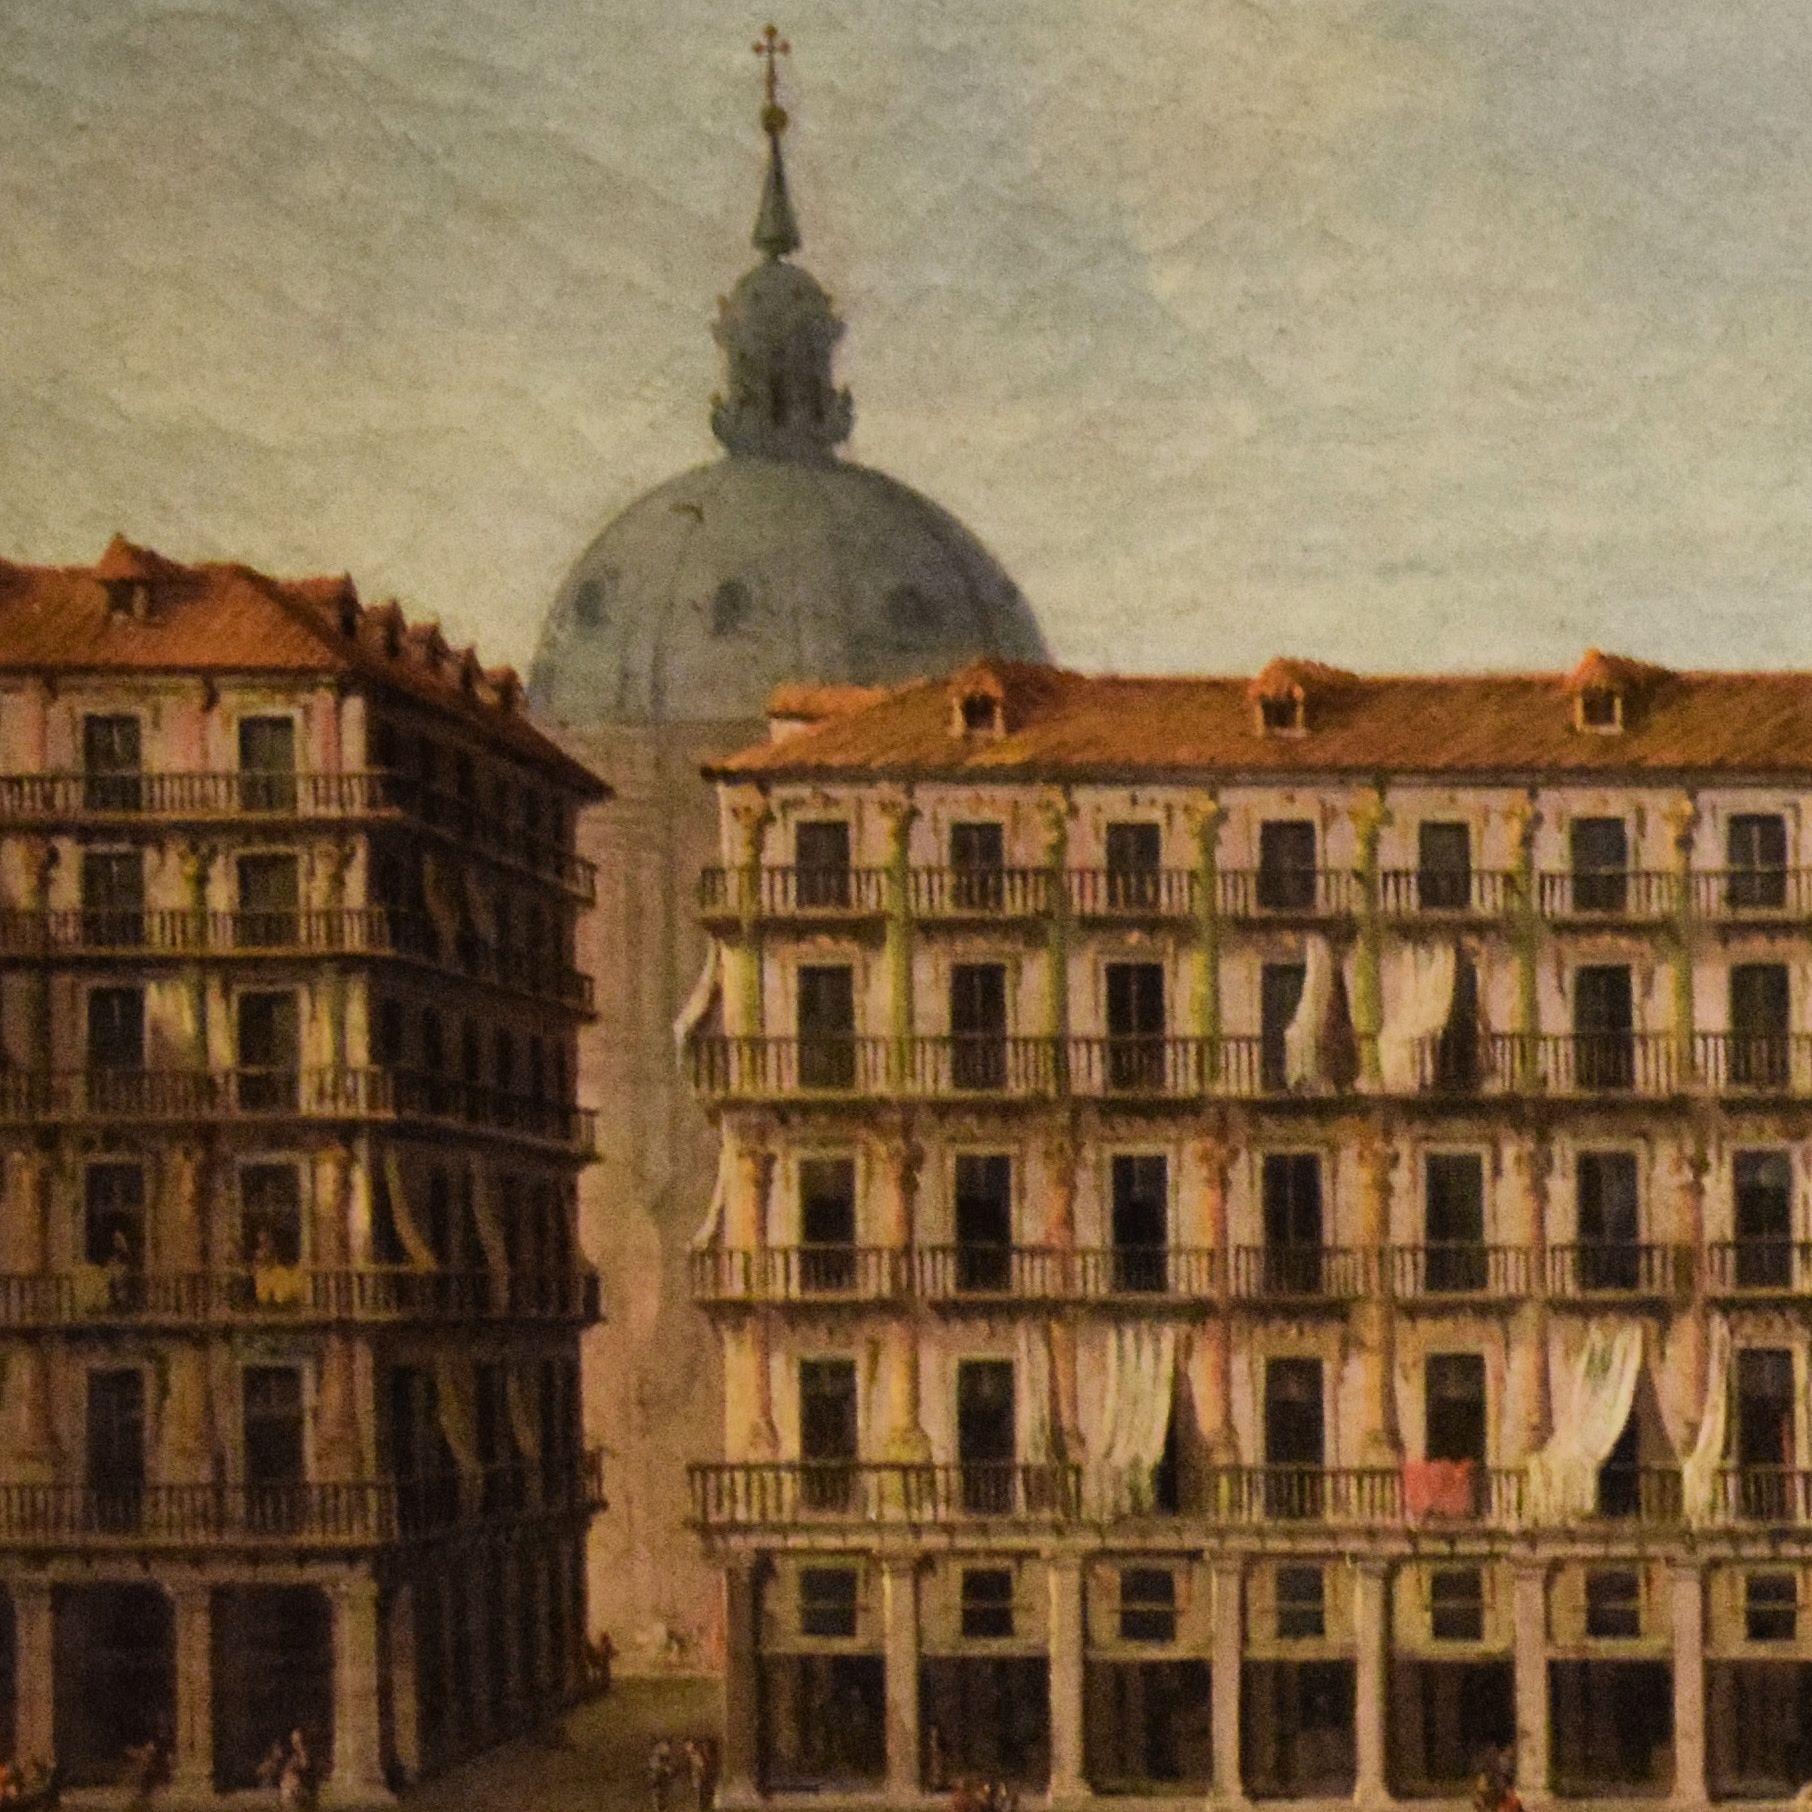 La Casa Profesa de Madrid. Un singular edificio desaparecido.